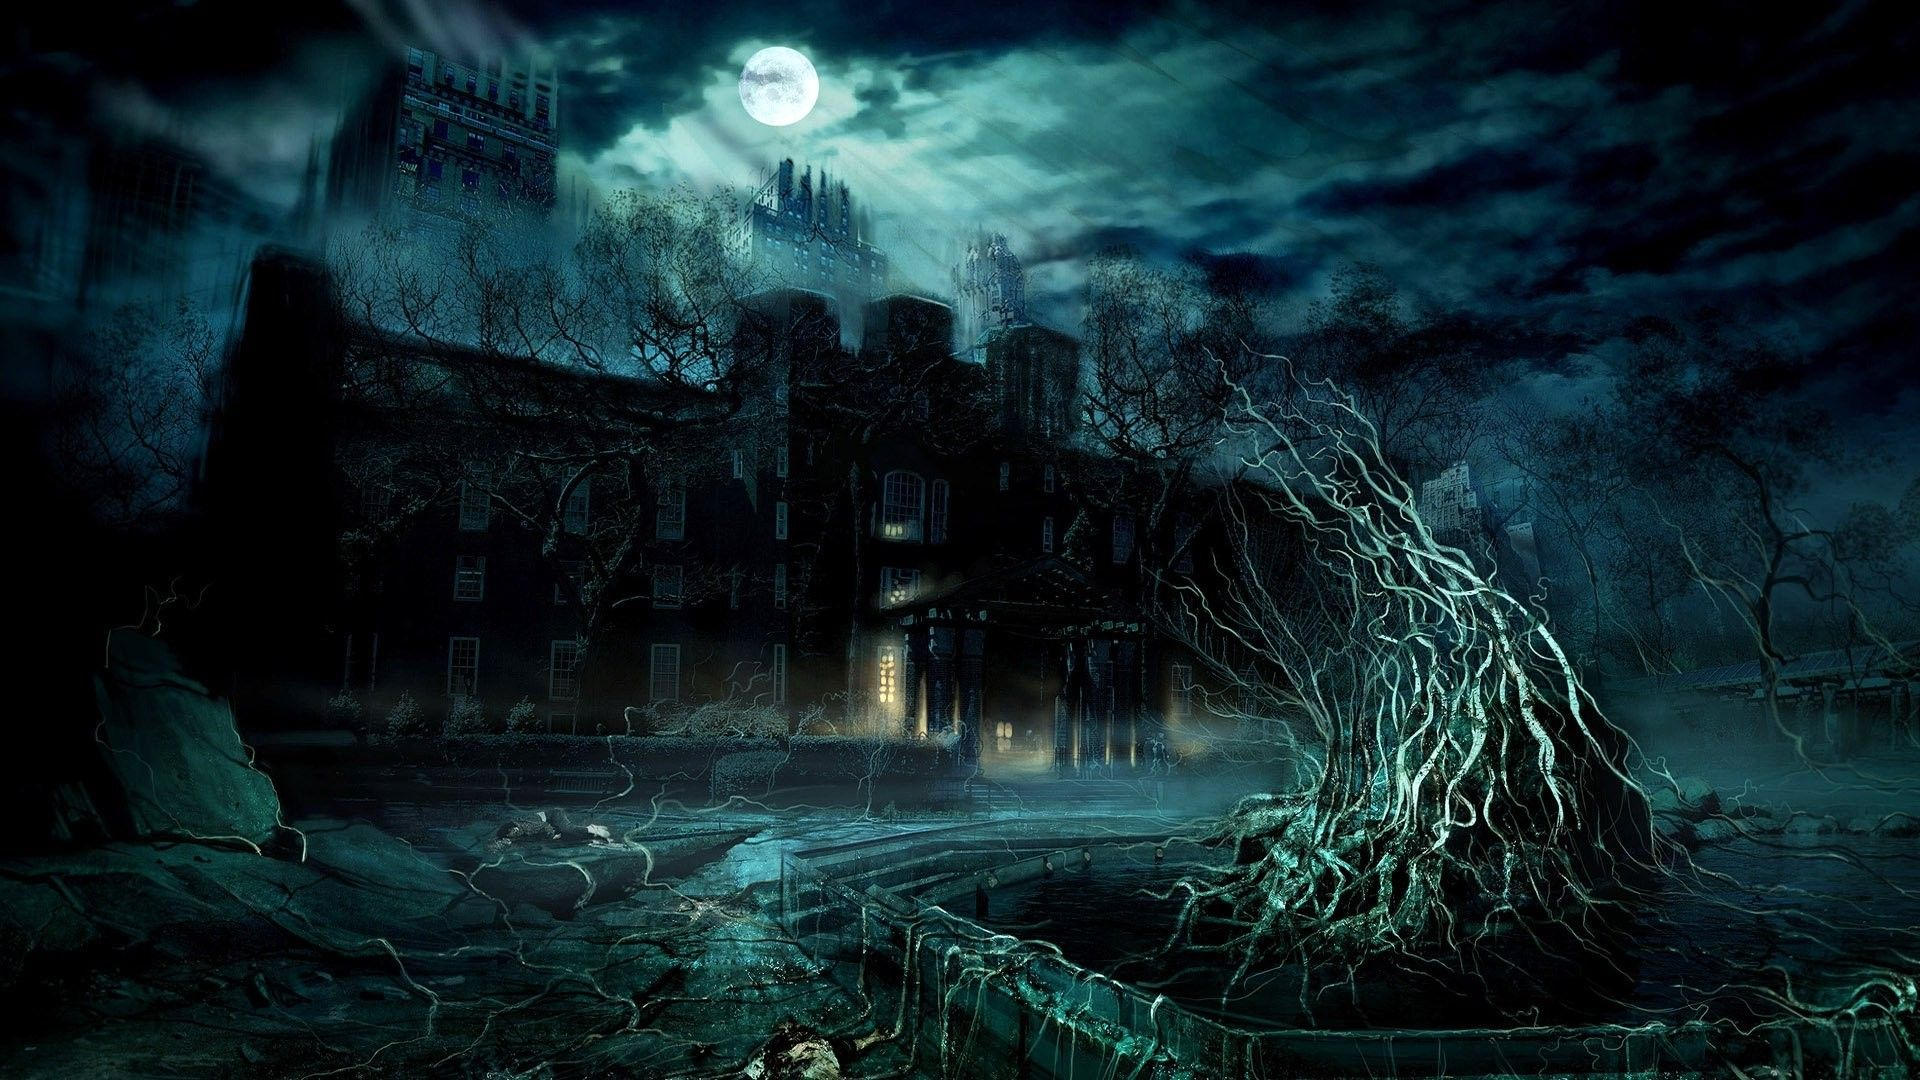 Moon Wallpapers Buscar Con Google Gothic Wallpaper Dark